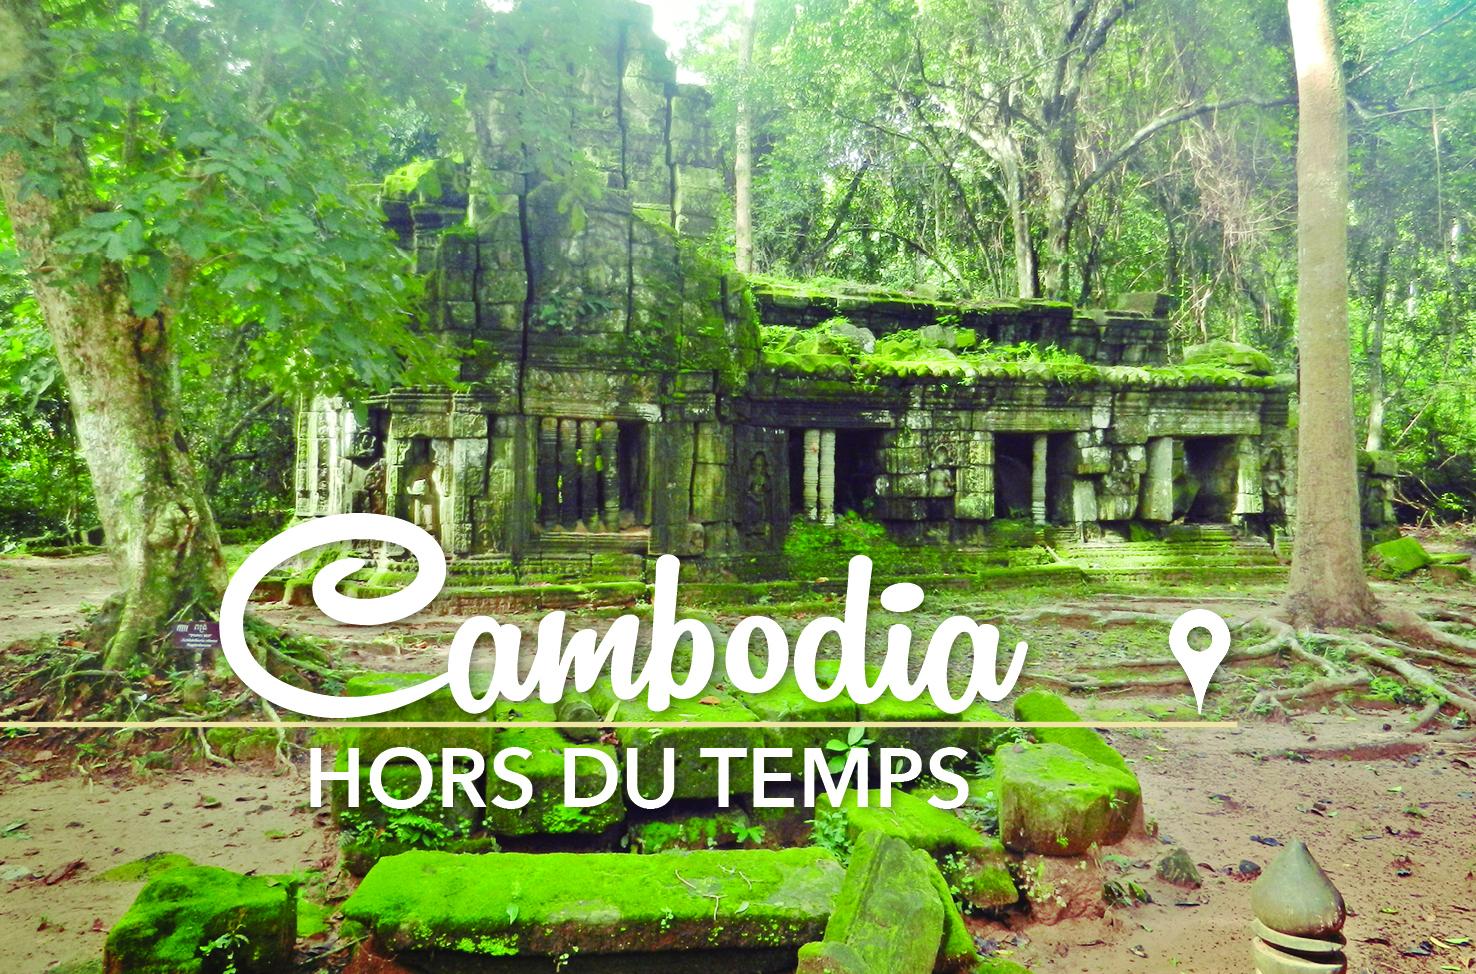 Cambodge, Angkor, temple, Asie, voyage, khmer, Cambodia